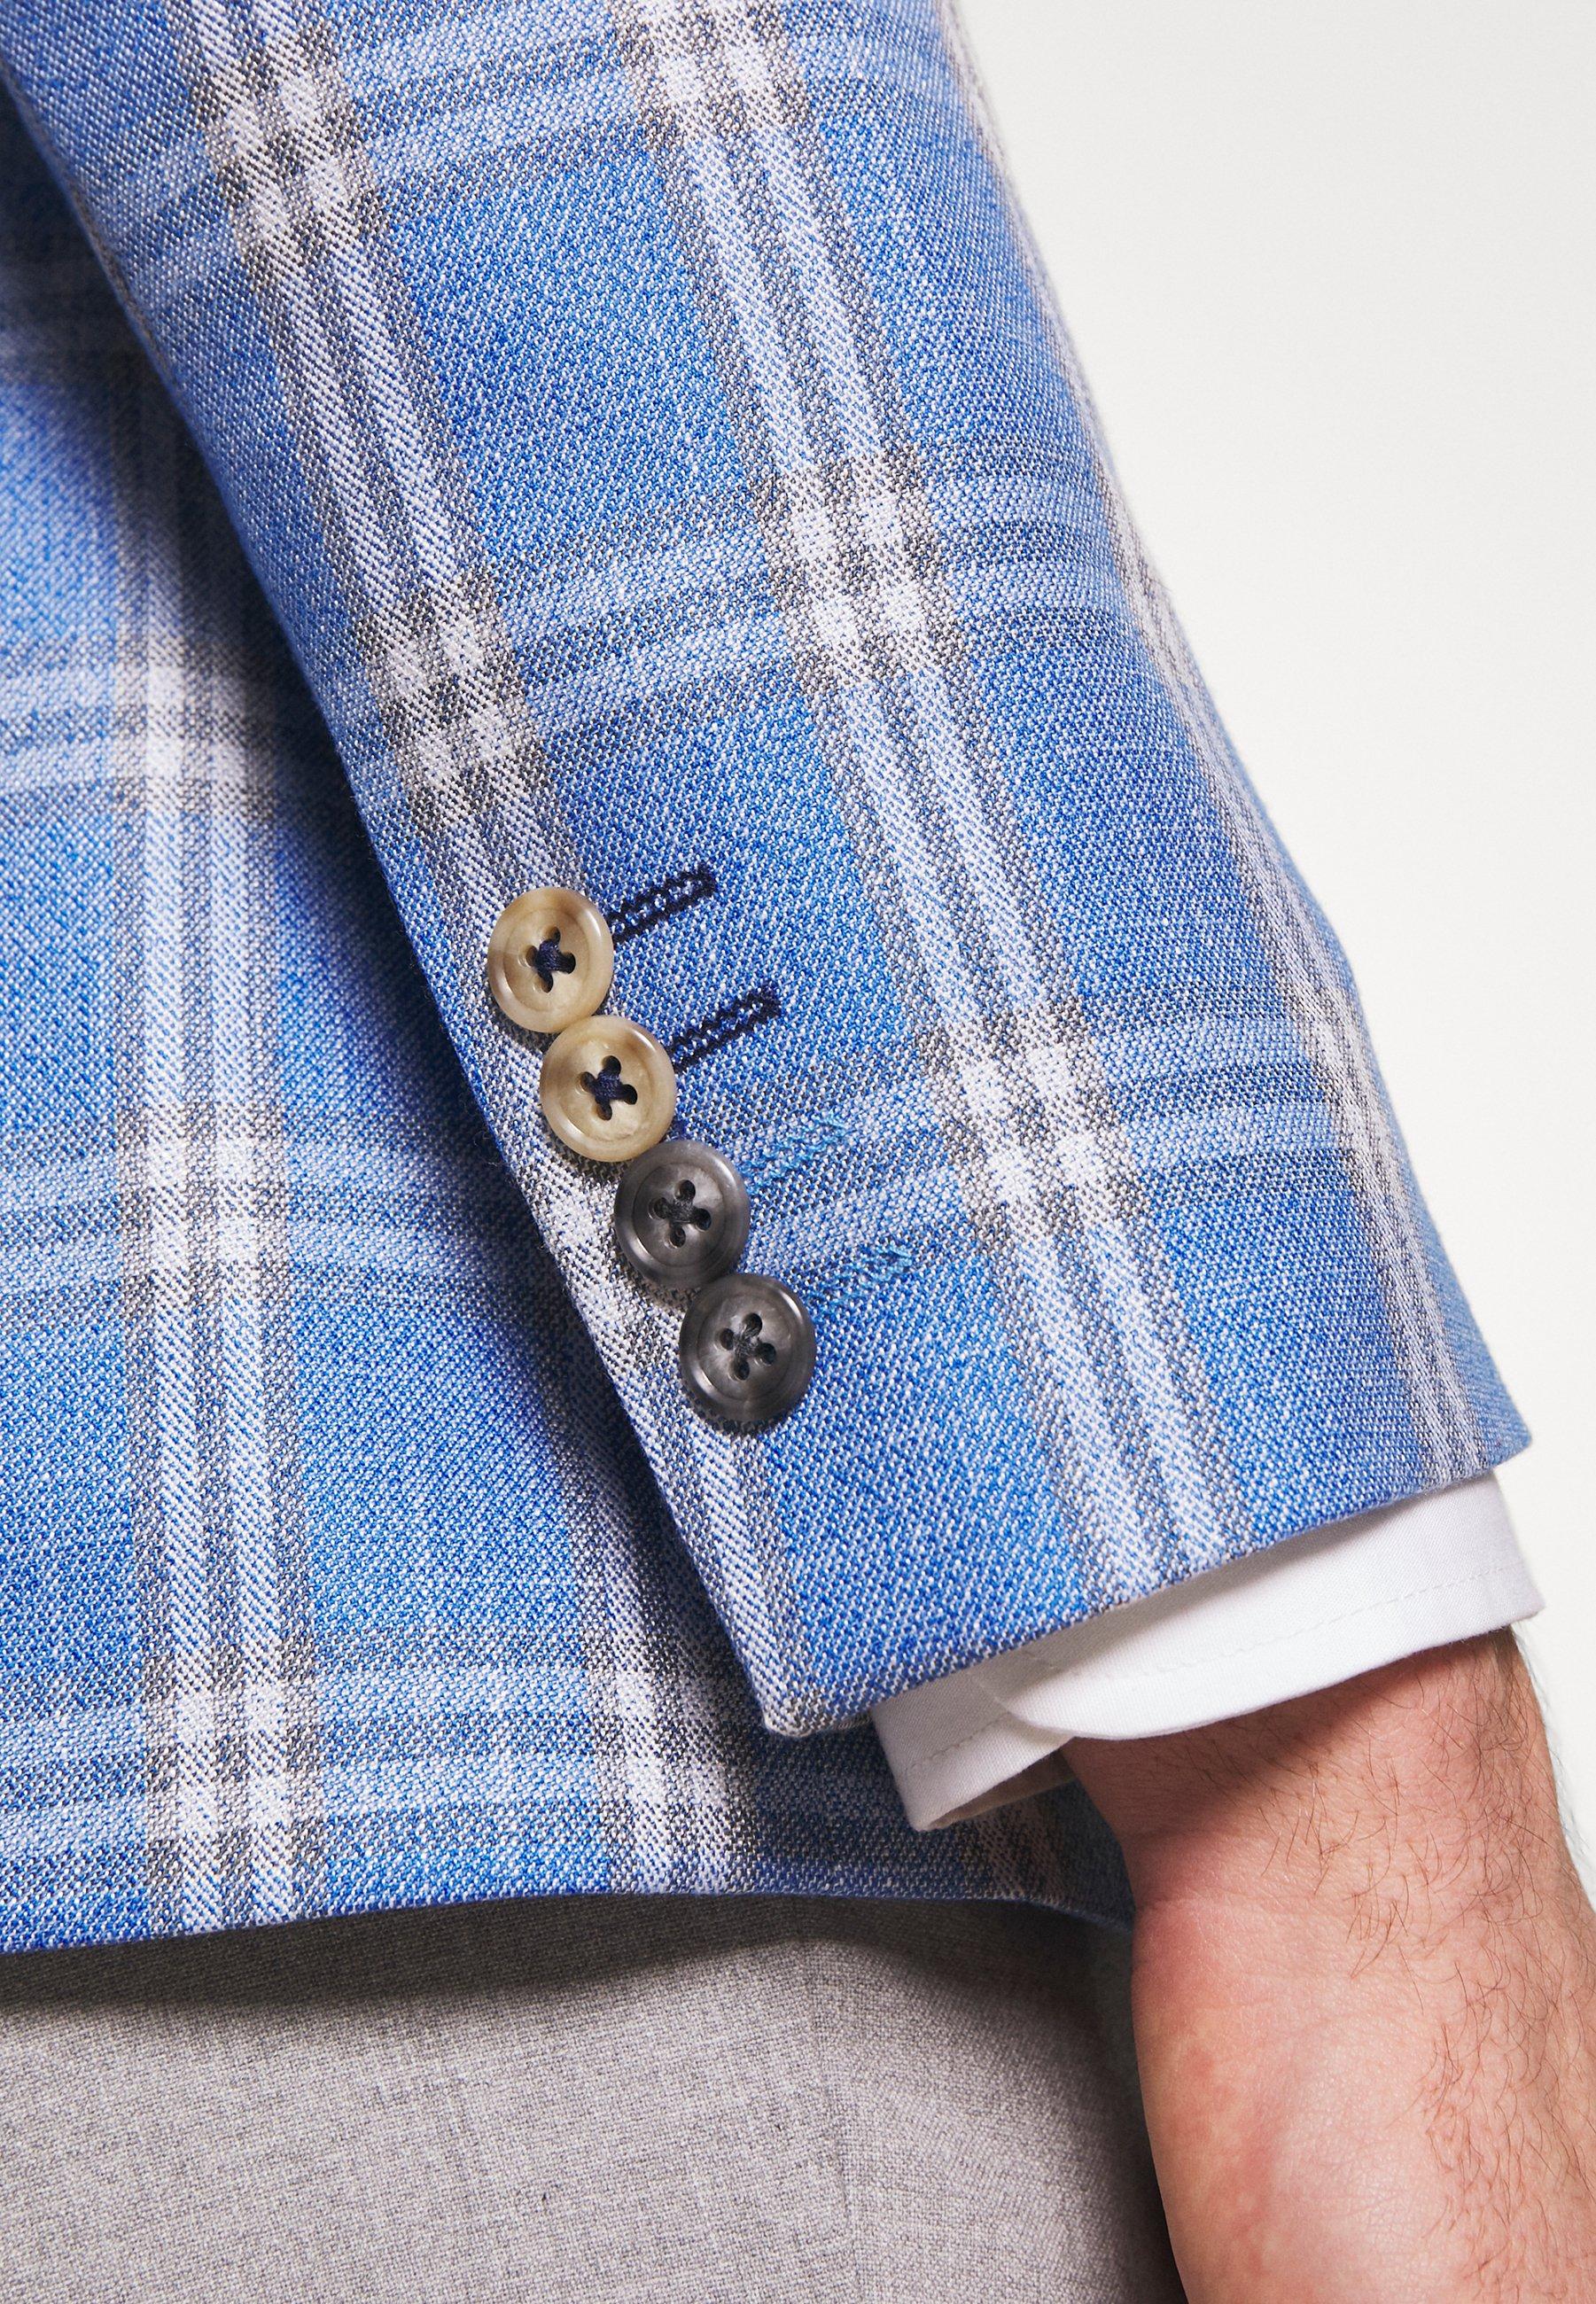 1904 Asher Grid Check Jacket - Colbert Light Blue